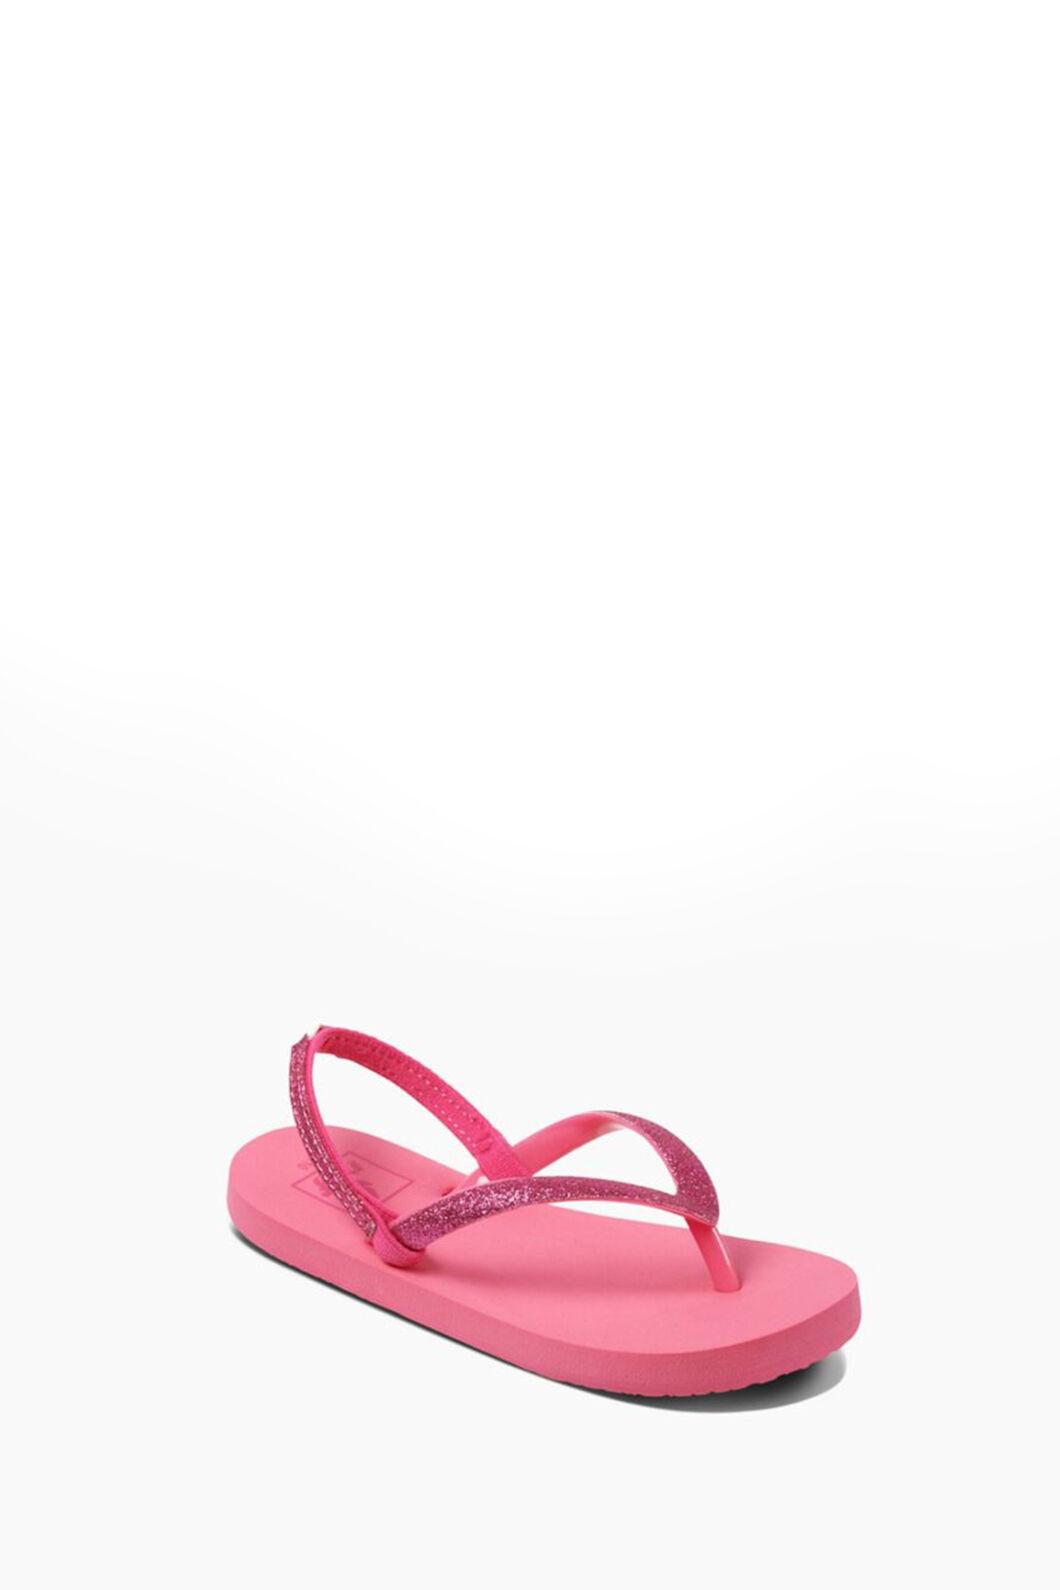 Reef Little Stargazer Sandals — Kids', Hot Pink, hi-res